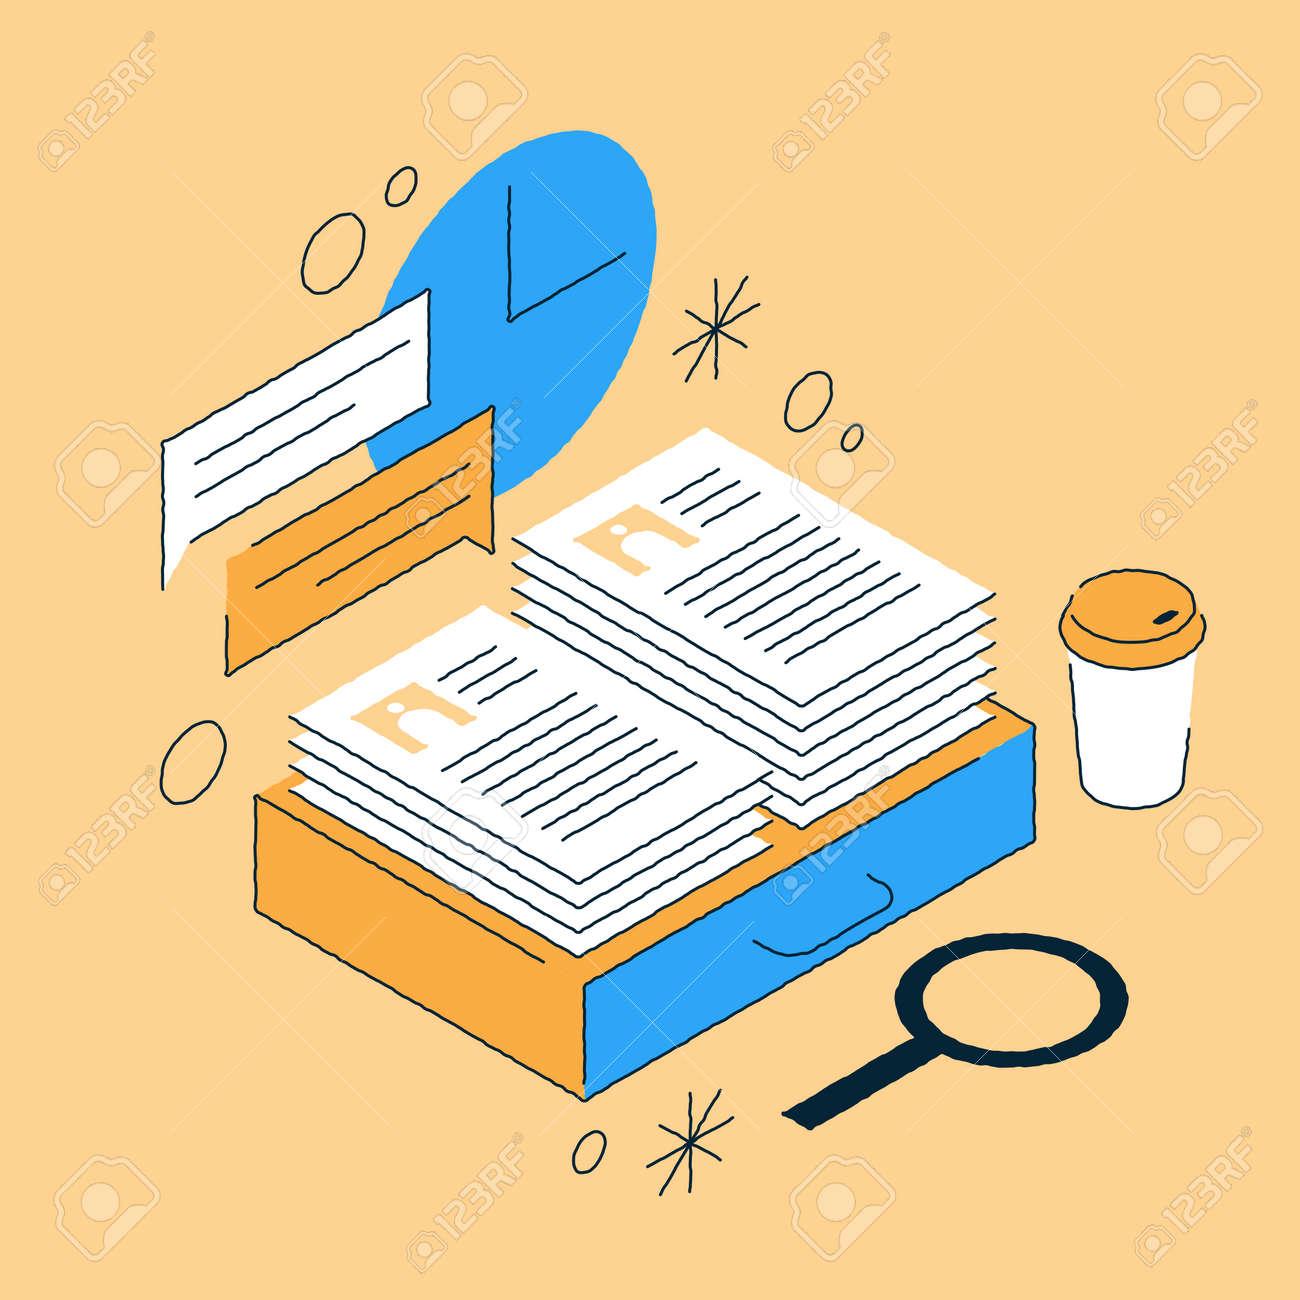 Job Recruiting Isometric Illustration - 171553467